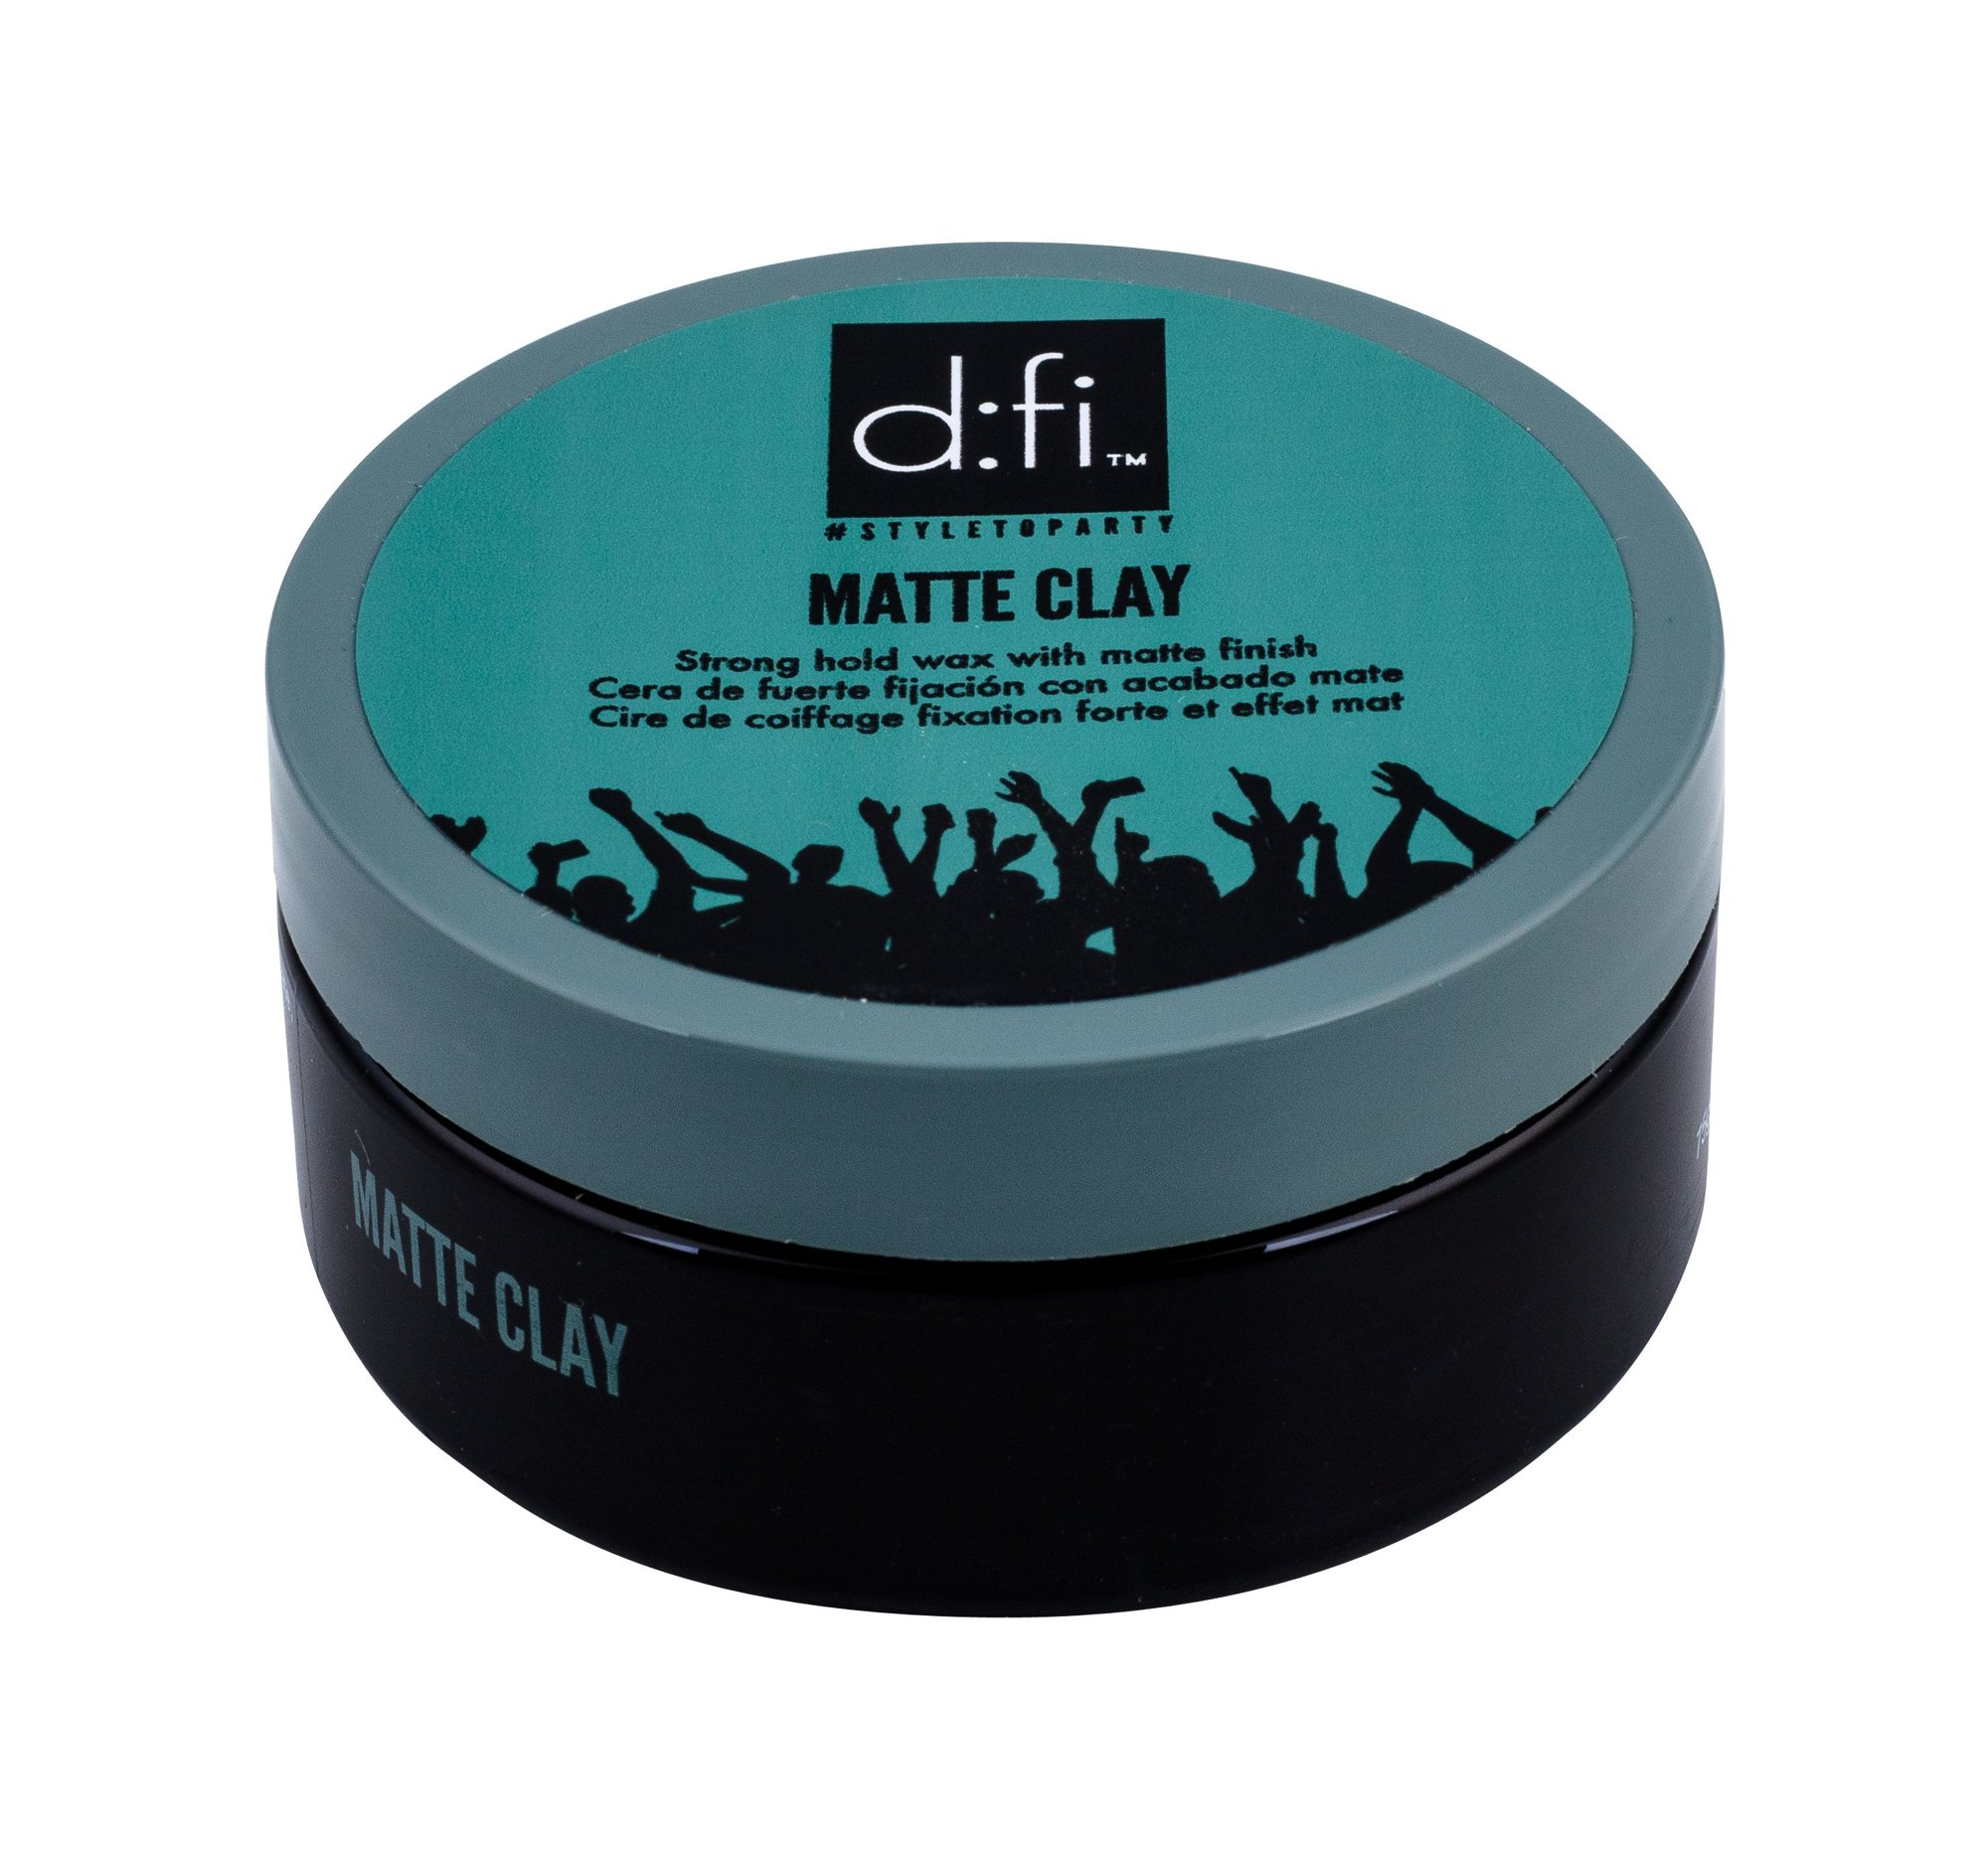 Revlon Professional d:fi Hair Wax 75ml